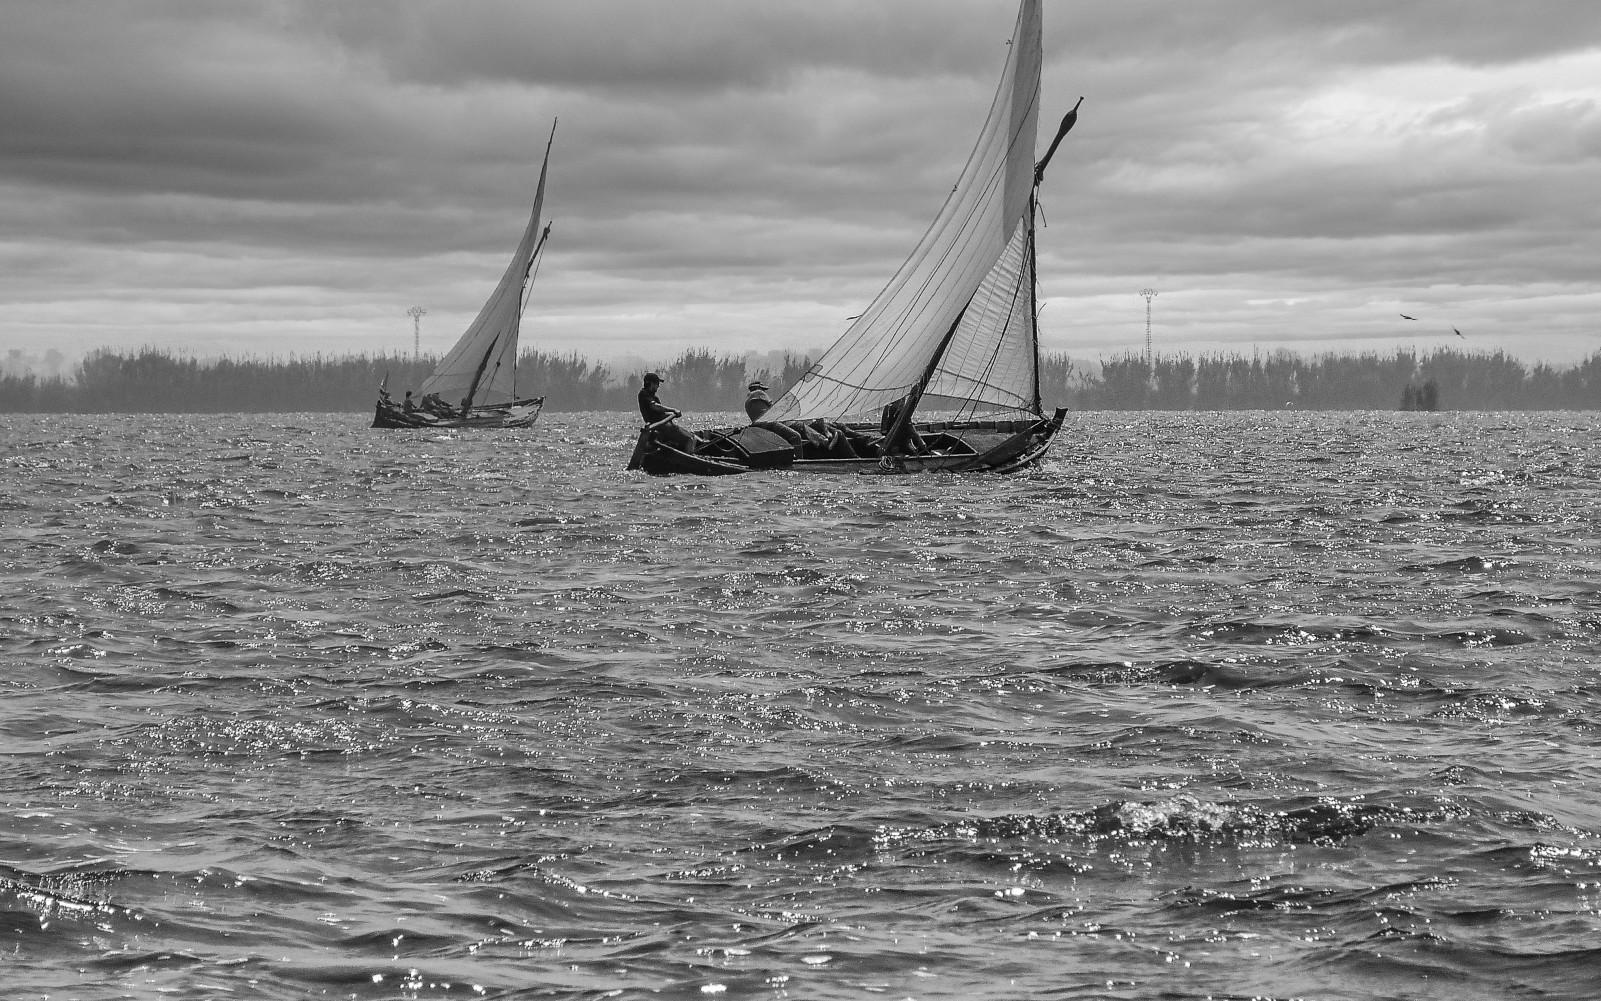 barca_larica-catarroja 12052018-P1850559 lola_ruiz